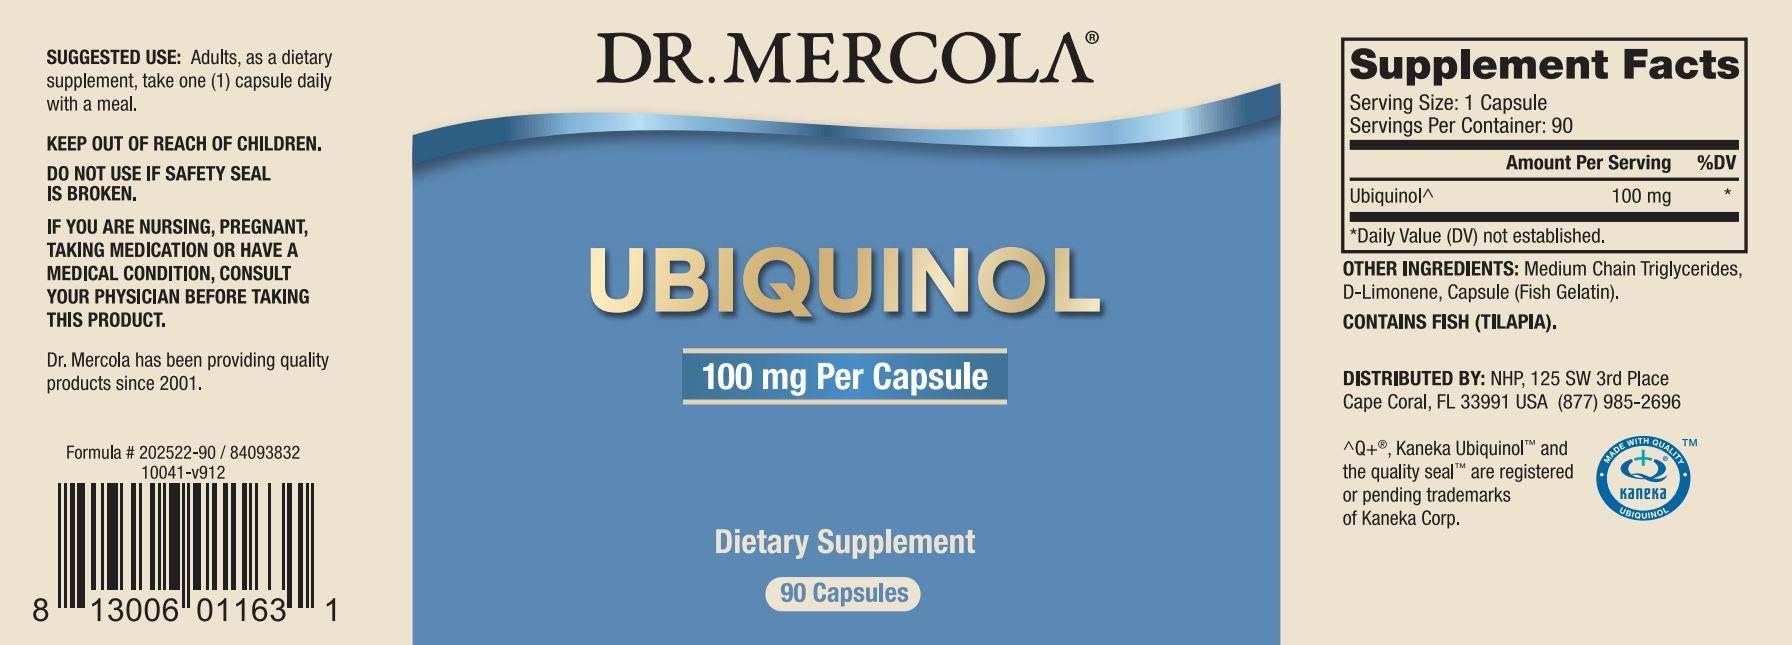 Dr. Mercola, Ubiquinol 100 mg, 90 Servings (90 Capsules), Non GMO, Soy-Free, Gluten Free